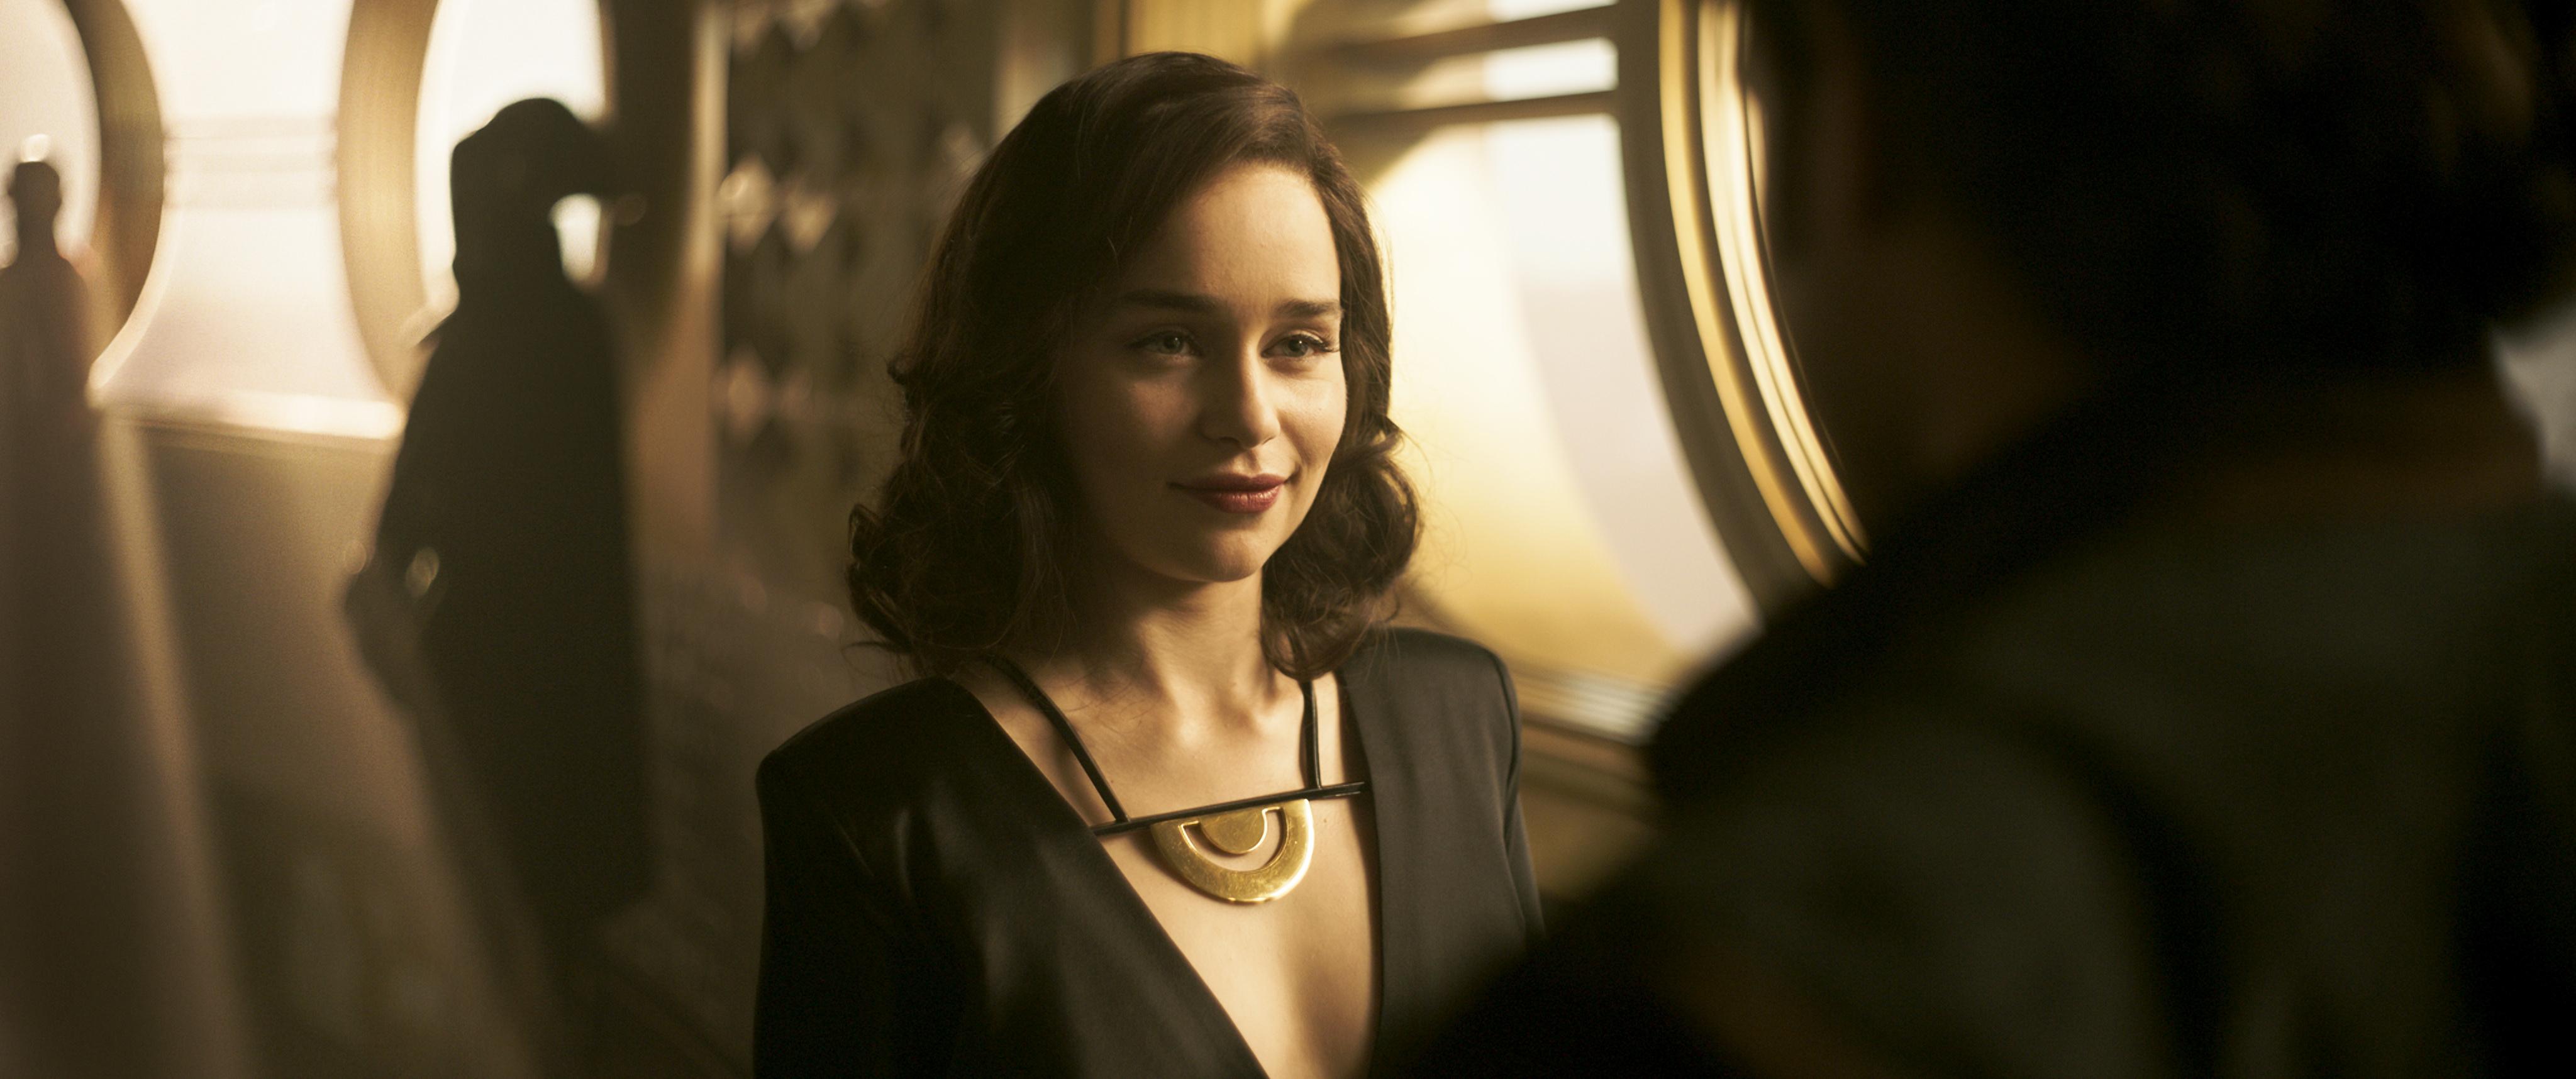 emilia clarke as qira solo a star wars story movie kv